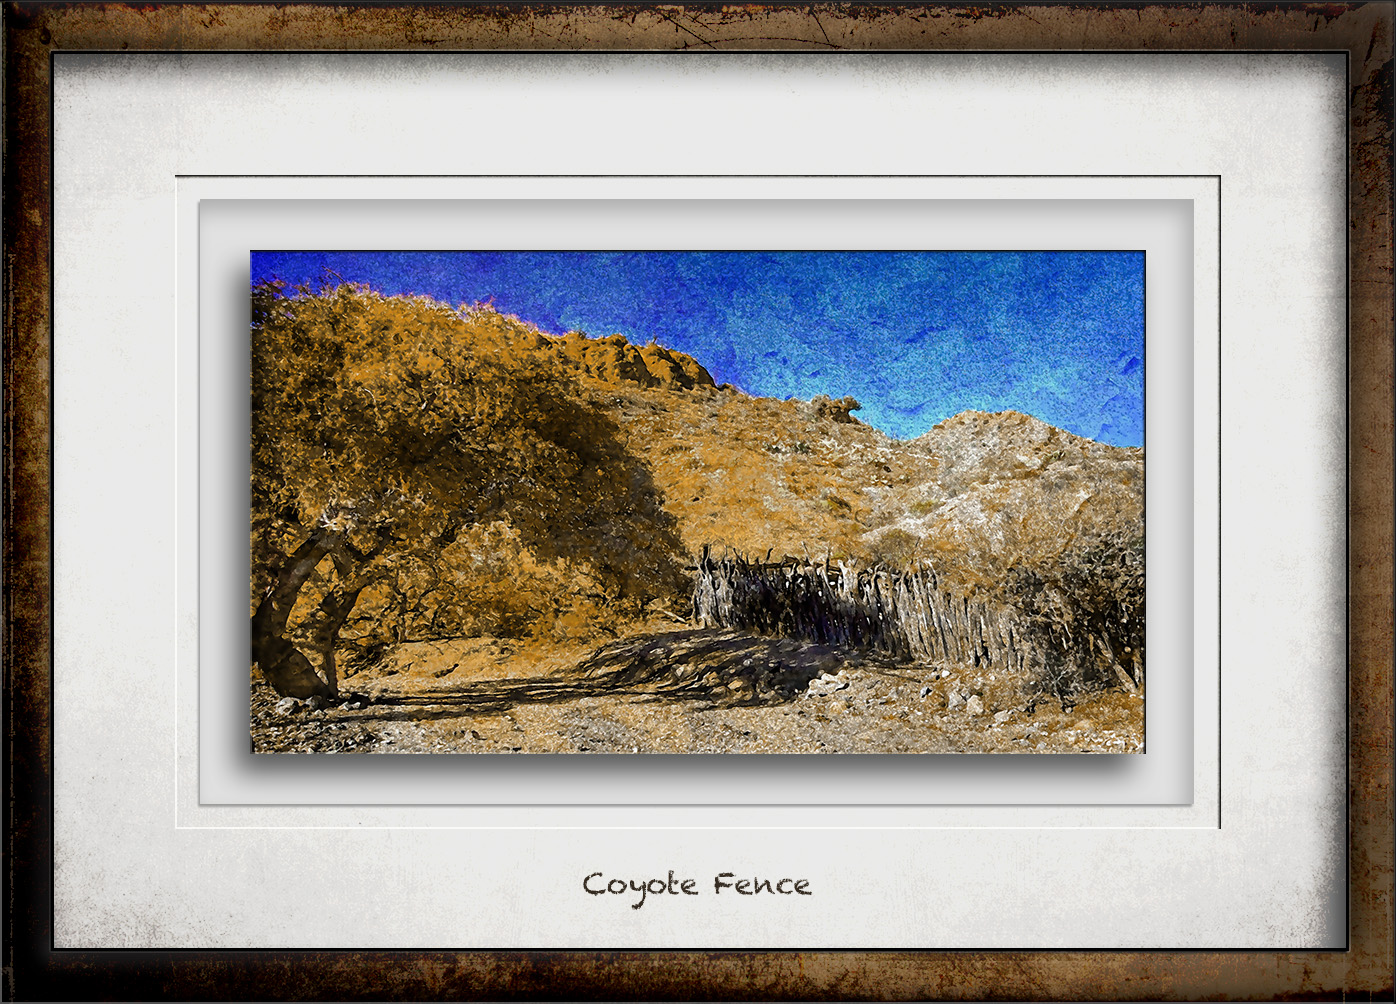 Doubtful Canyon Weekend Dec 2012